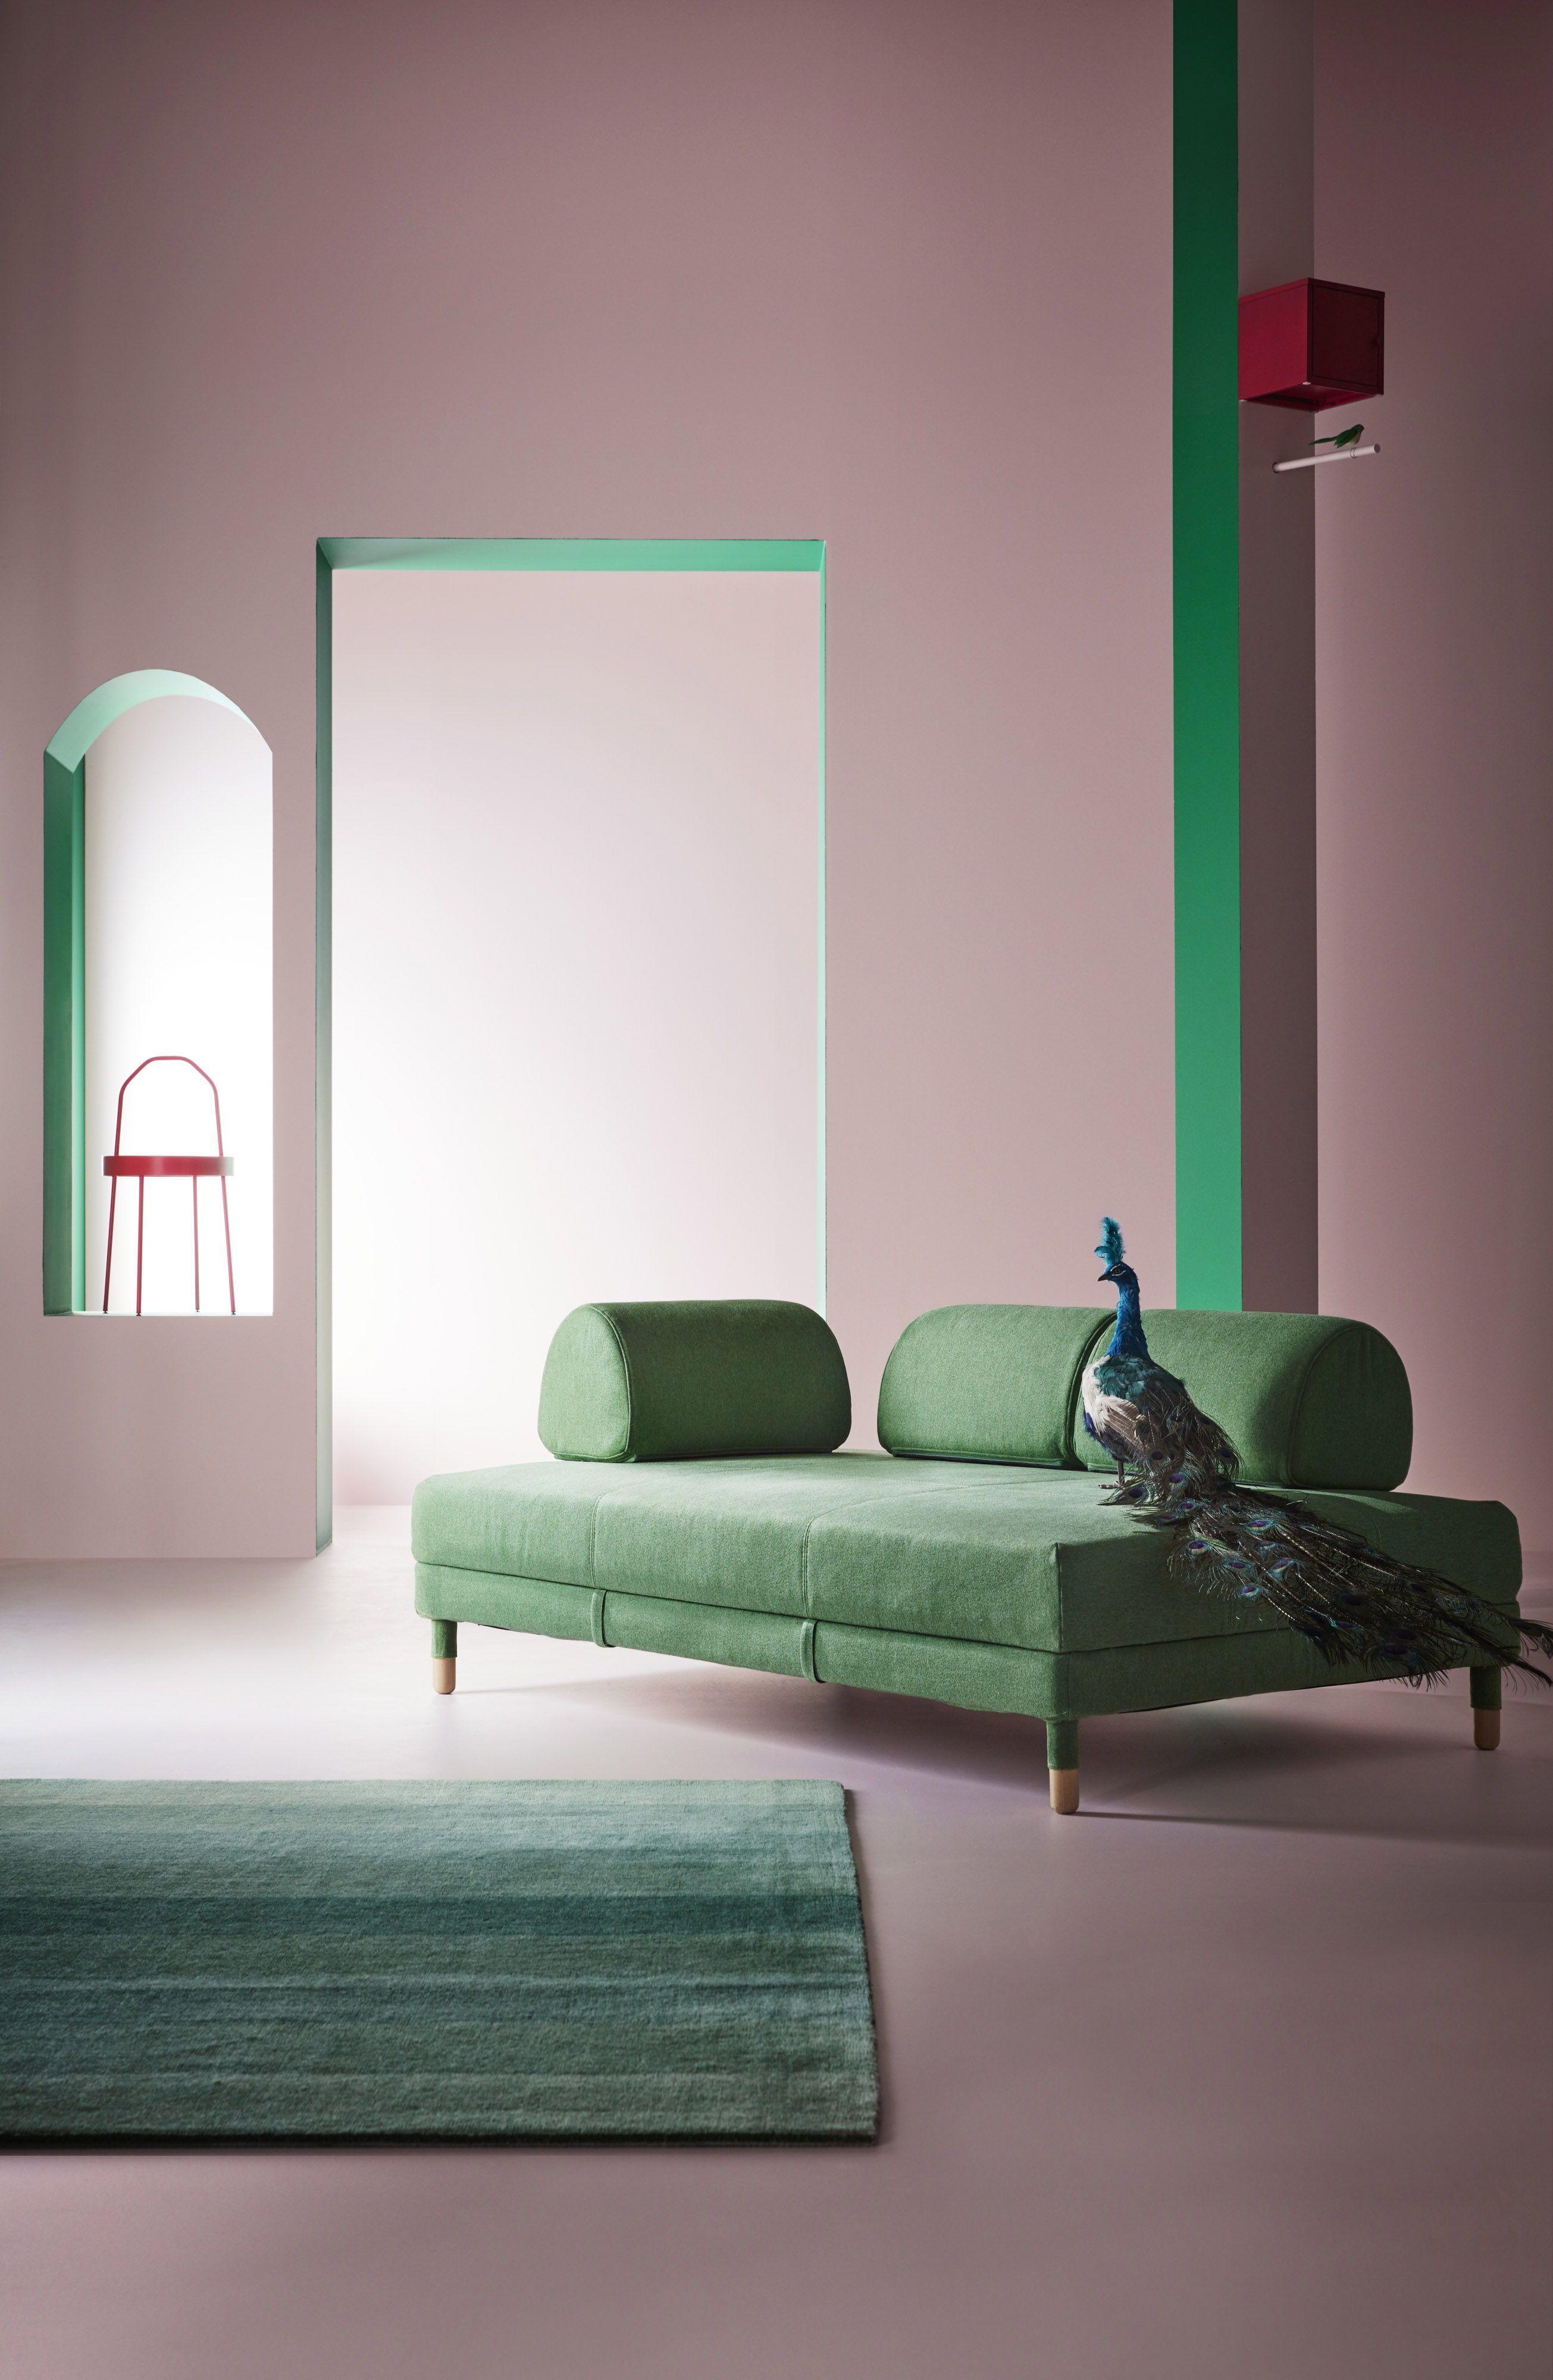 ikea kuche 2019. Black Bedroom Furniture Sets. Home Design Ideas